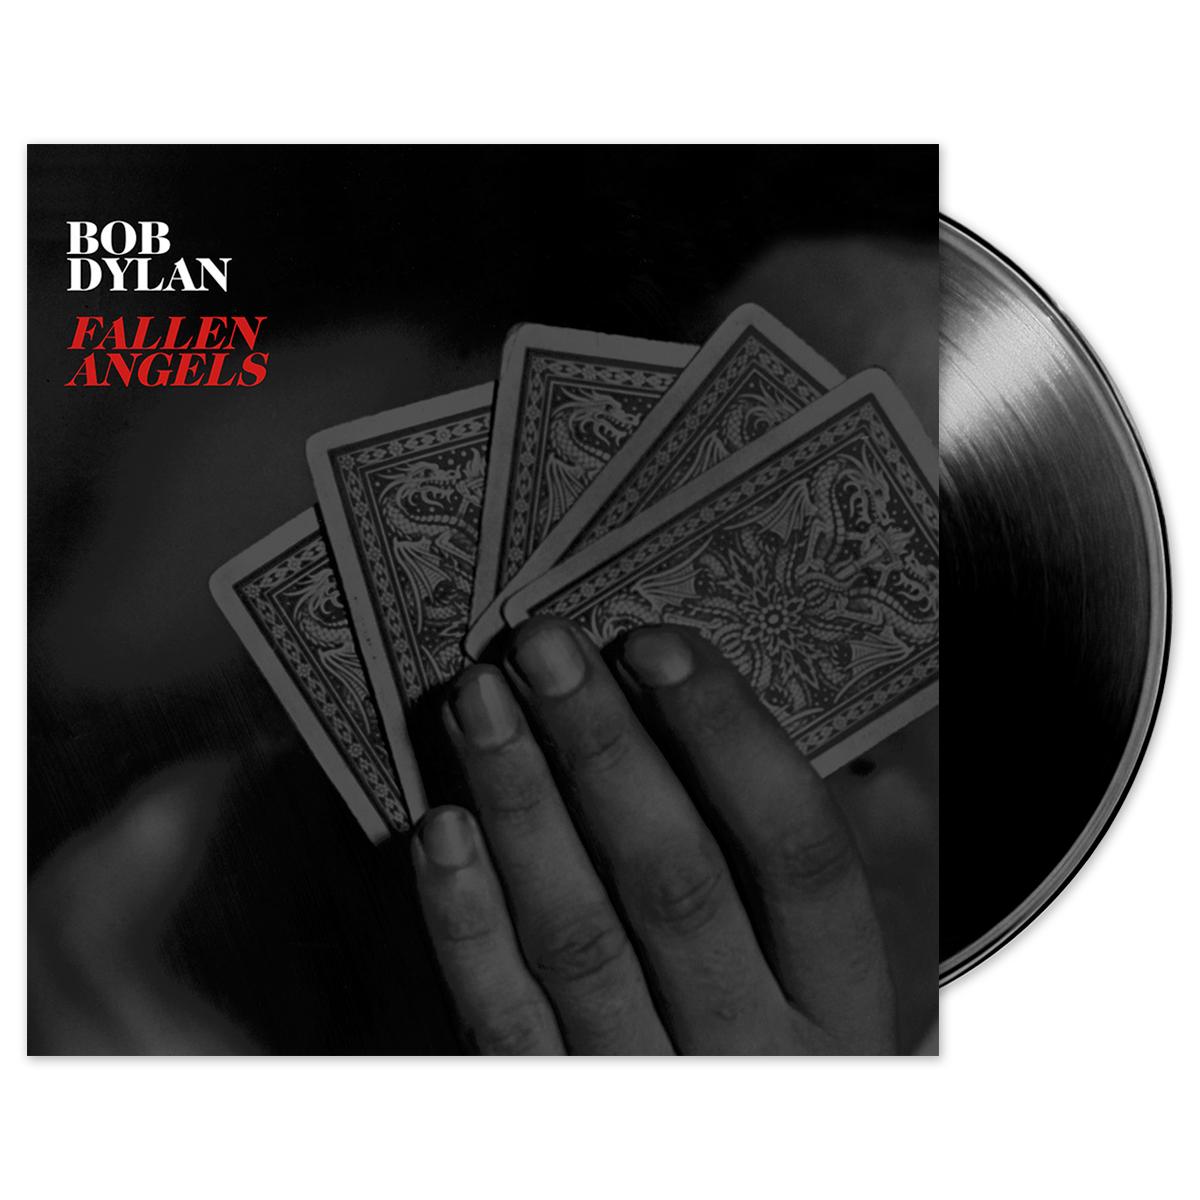 "Bob Dylan ""Fallen Angels"" Vinyl"